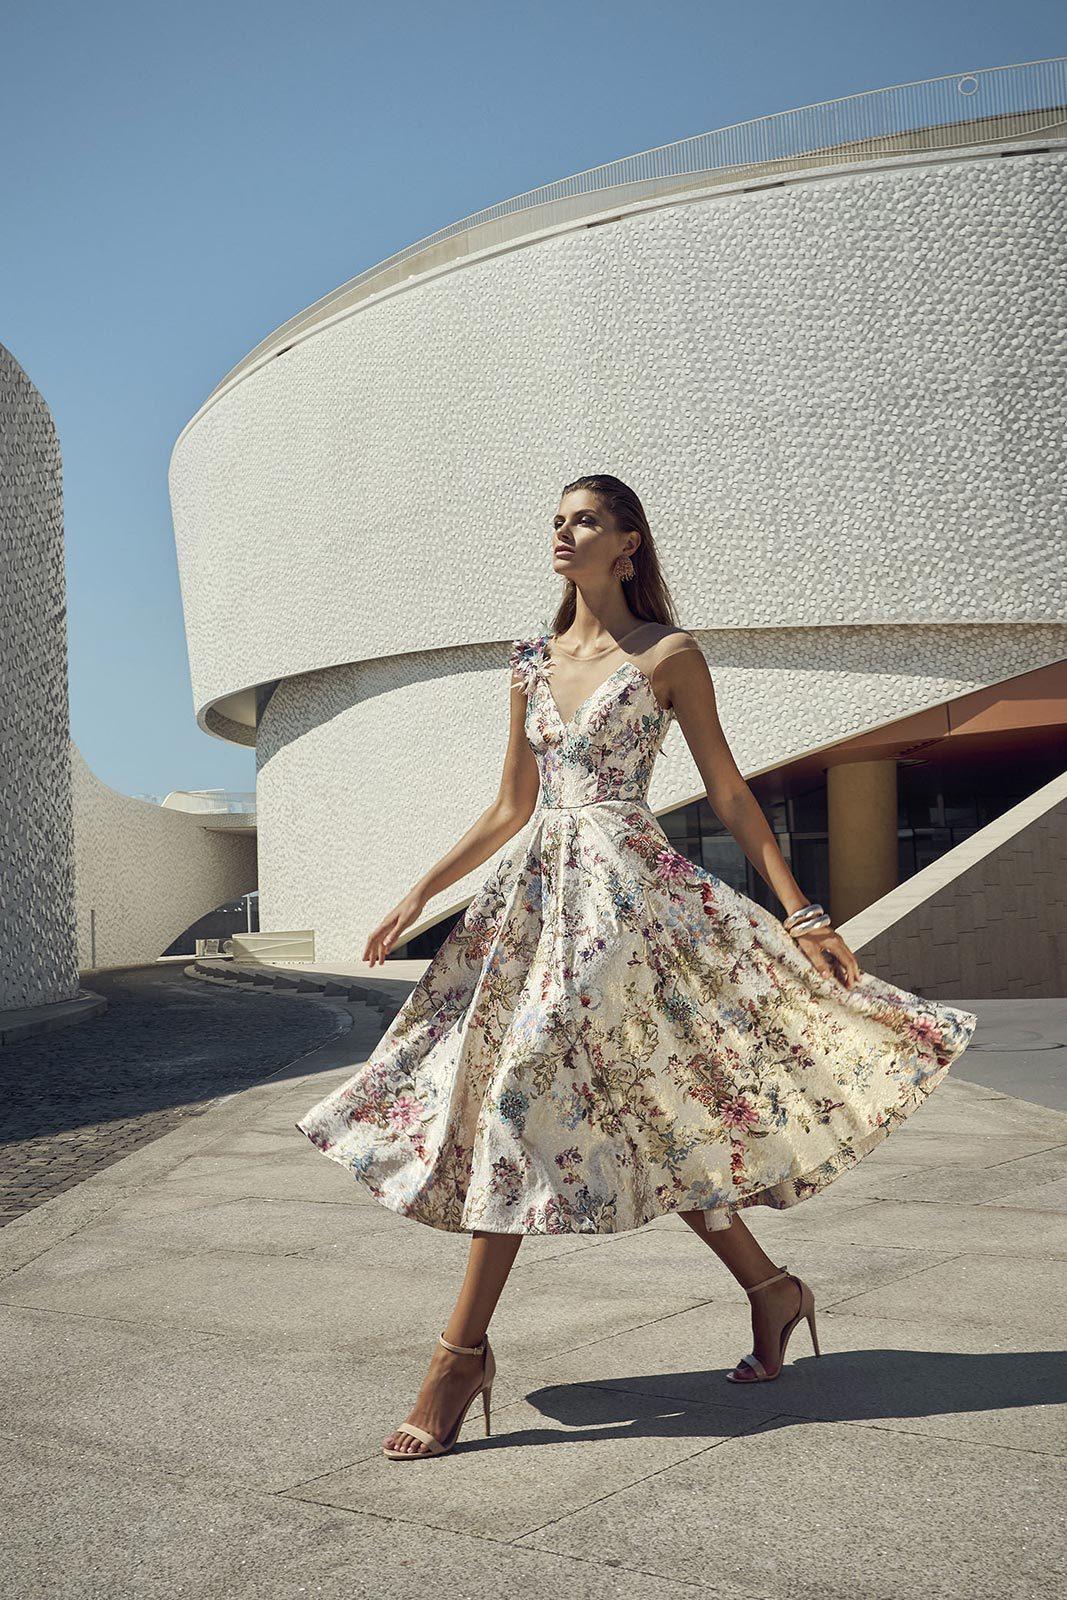 Floral Dress with Full Skirt CRDRFLOR